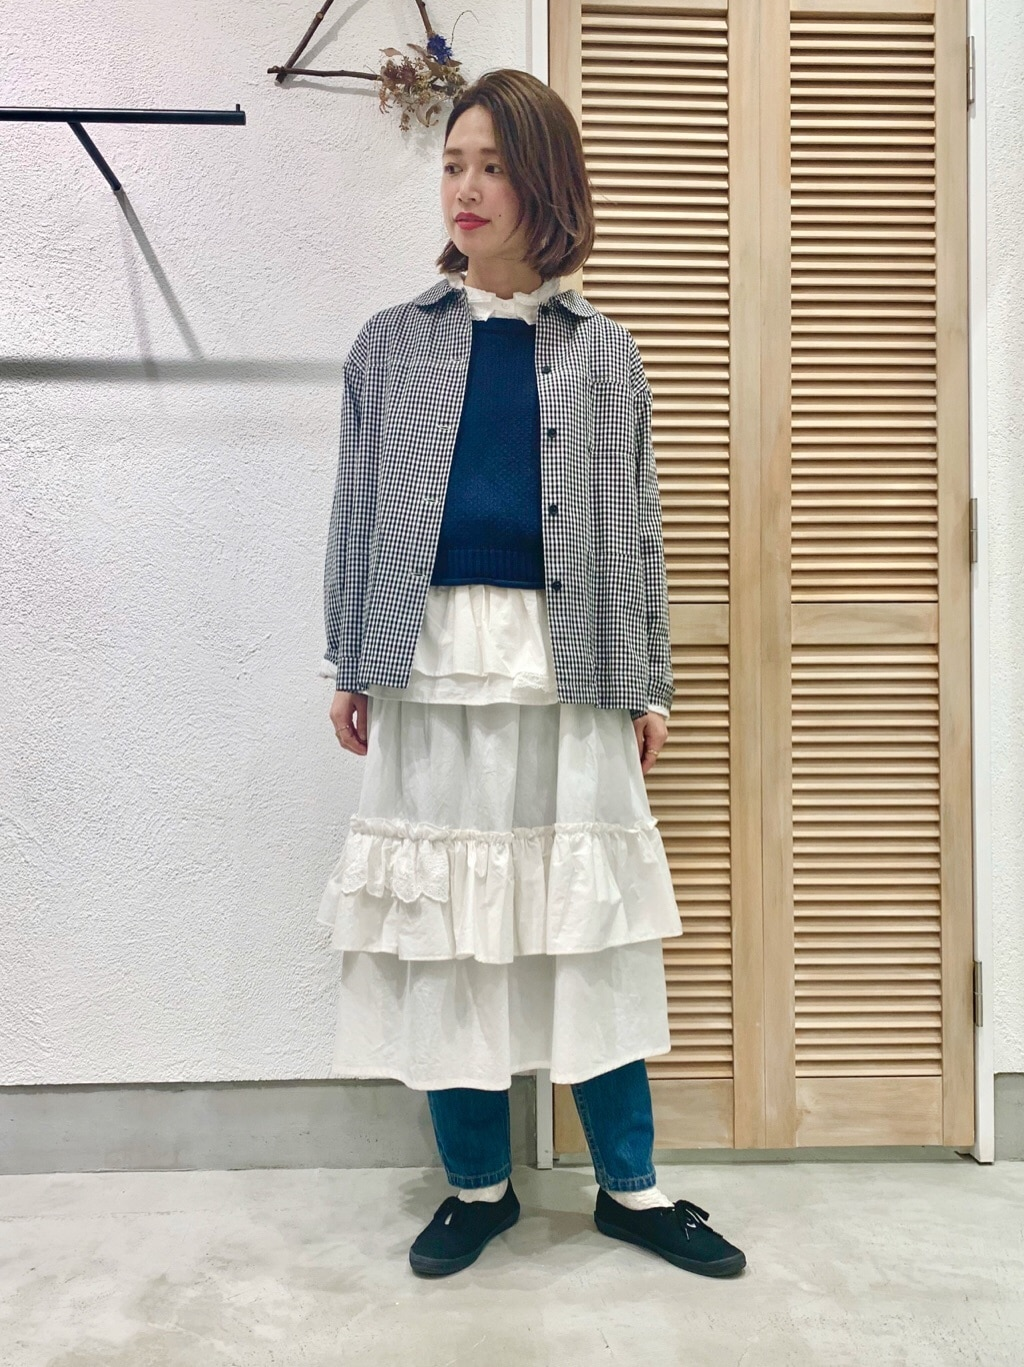 chambre de charme 横浜ジョイナス 身長:160cm 2021.02.18